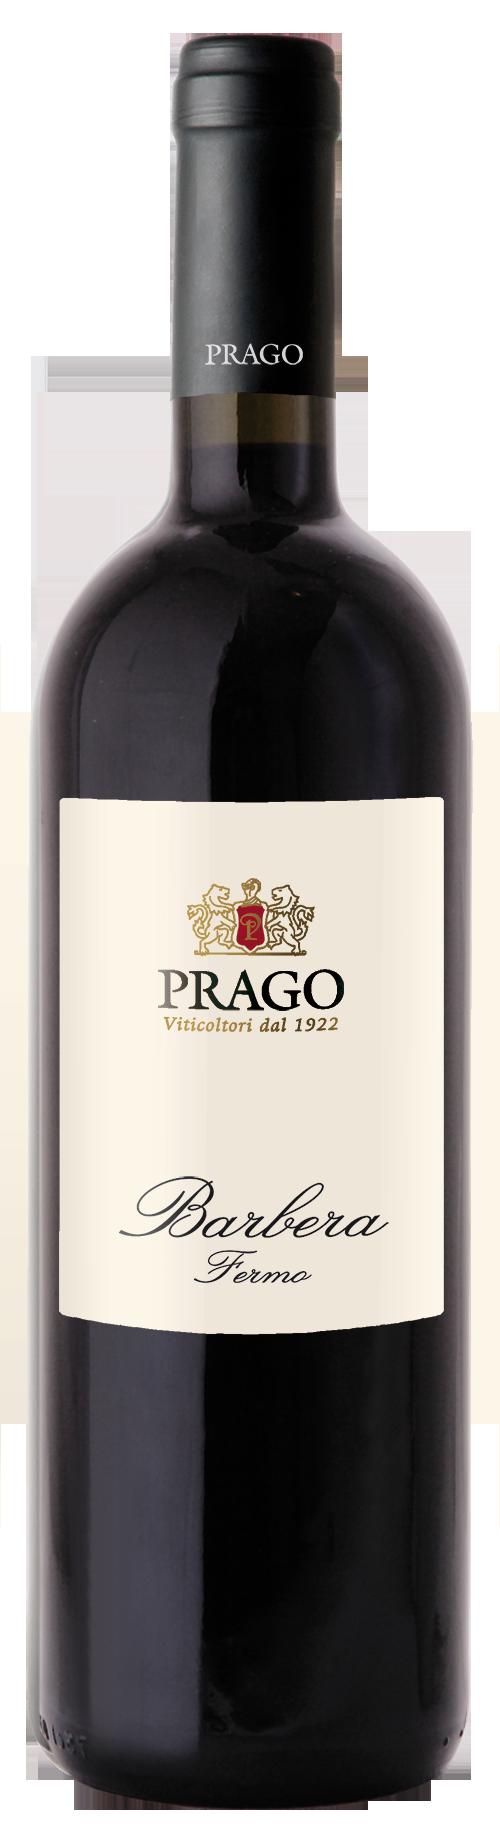 PRAGO Vini e Spumanti Oltrepò Pavese - Vini Fermi - Barbera